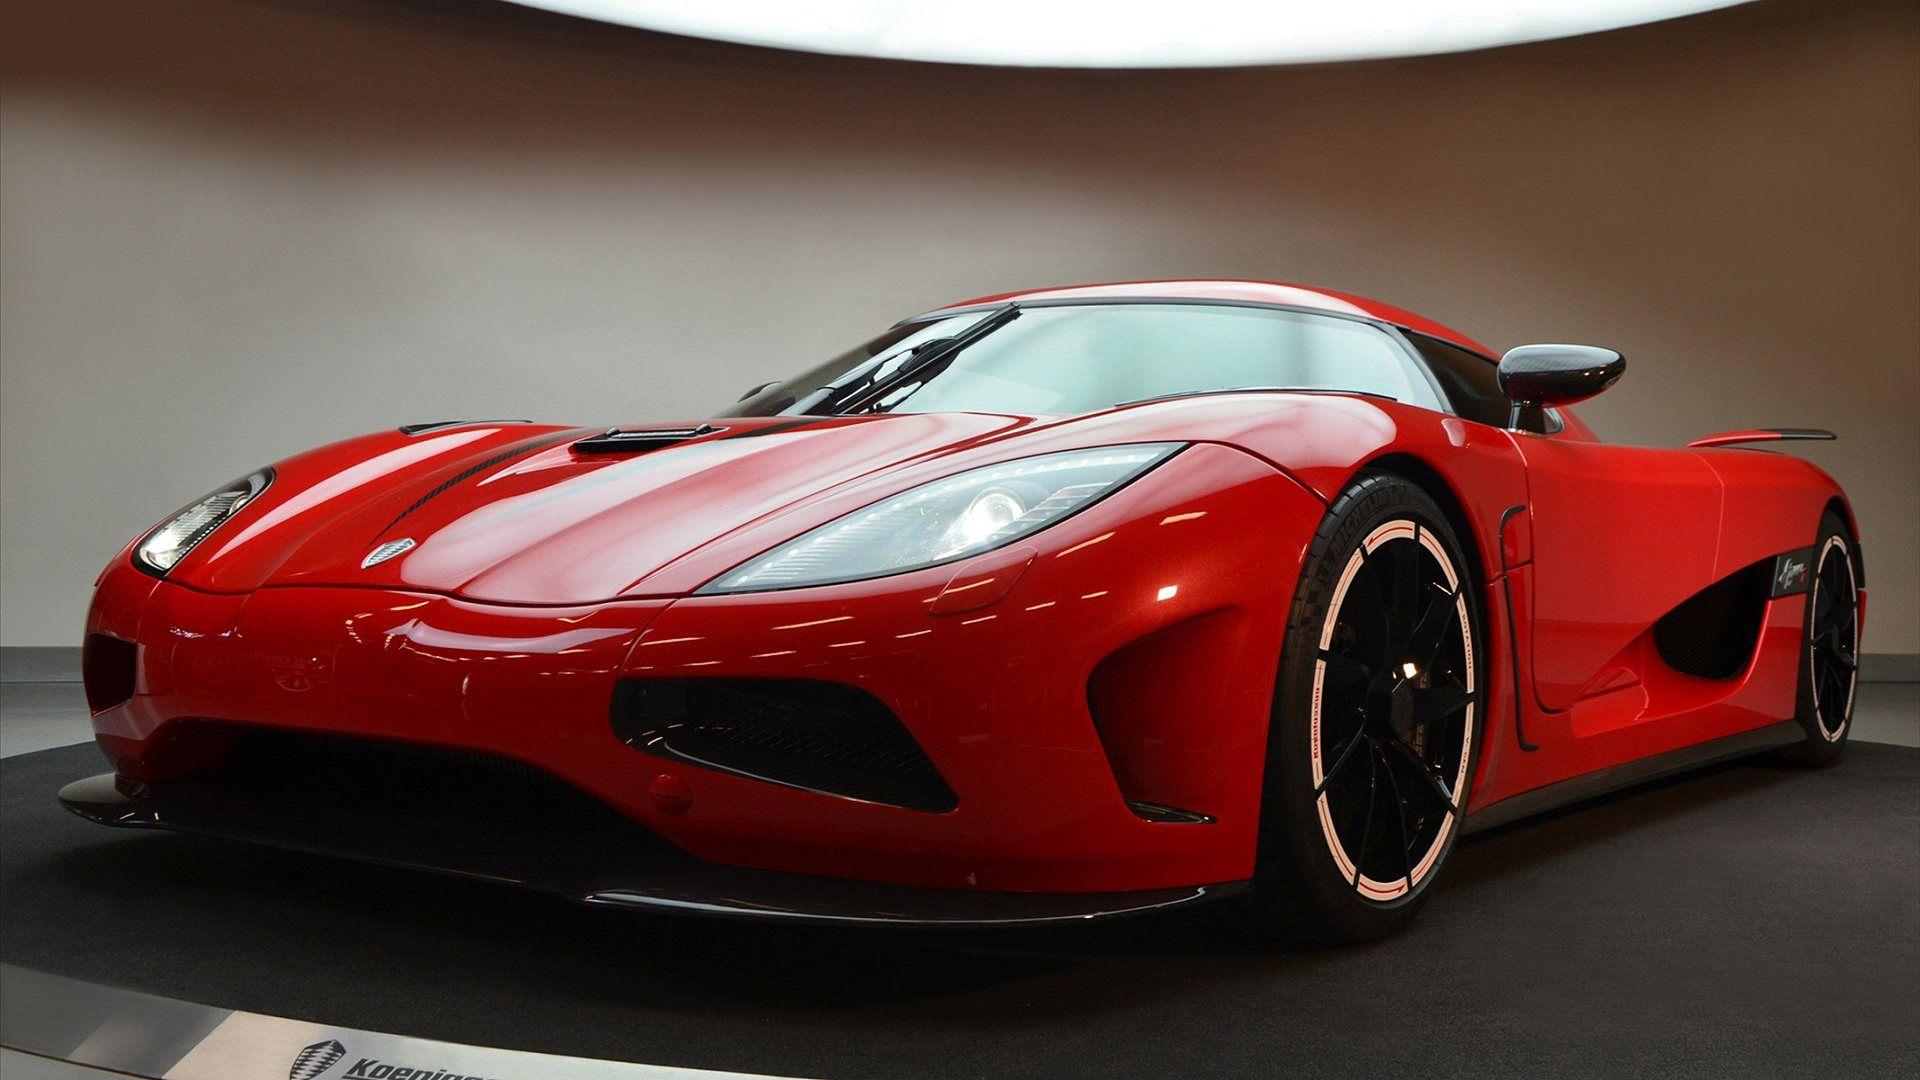 2014 koenigsegg agera r cars cars 1080p wallpaper | awesome future